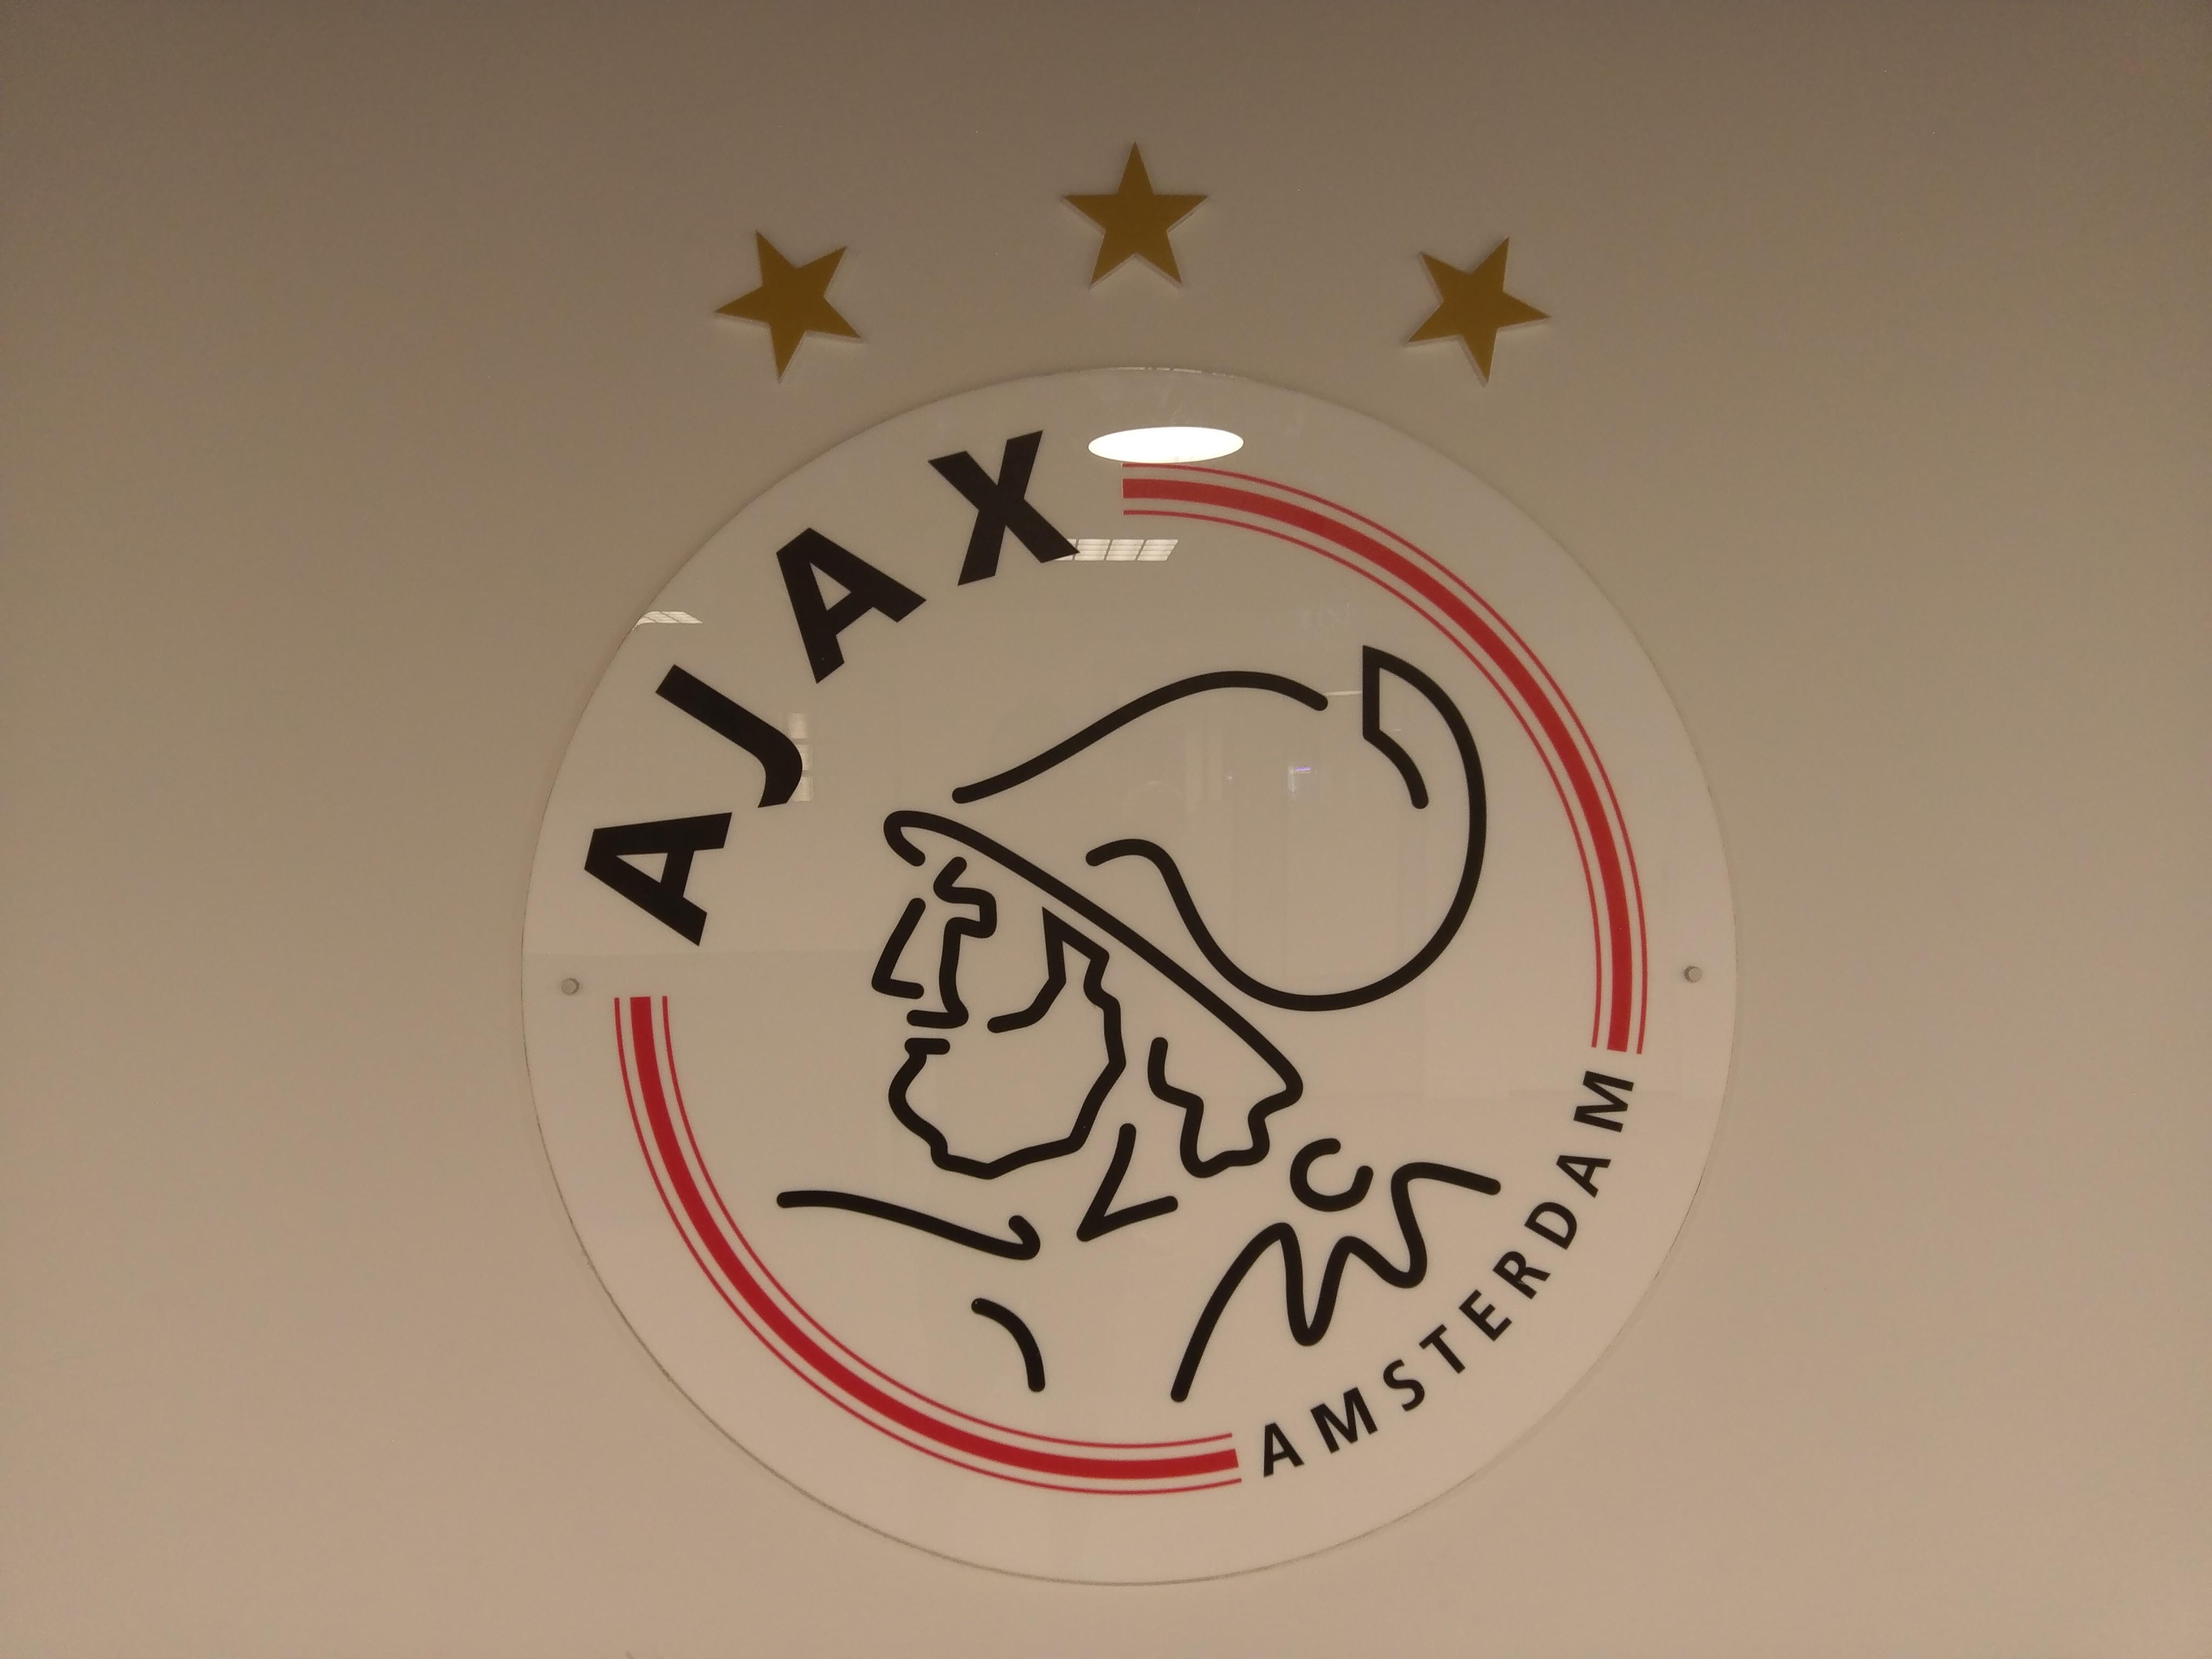 File:AFC Ajax logo inside Amsterdam Arena.jpg.